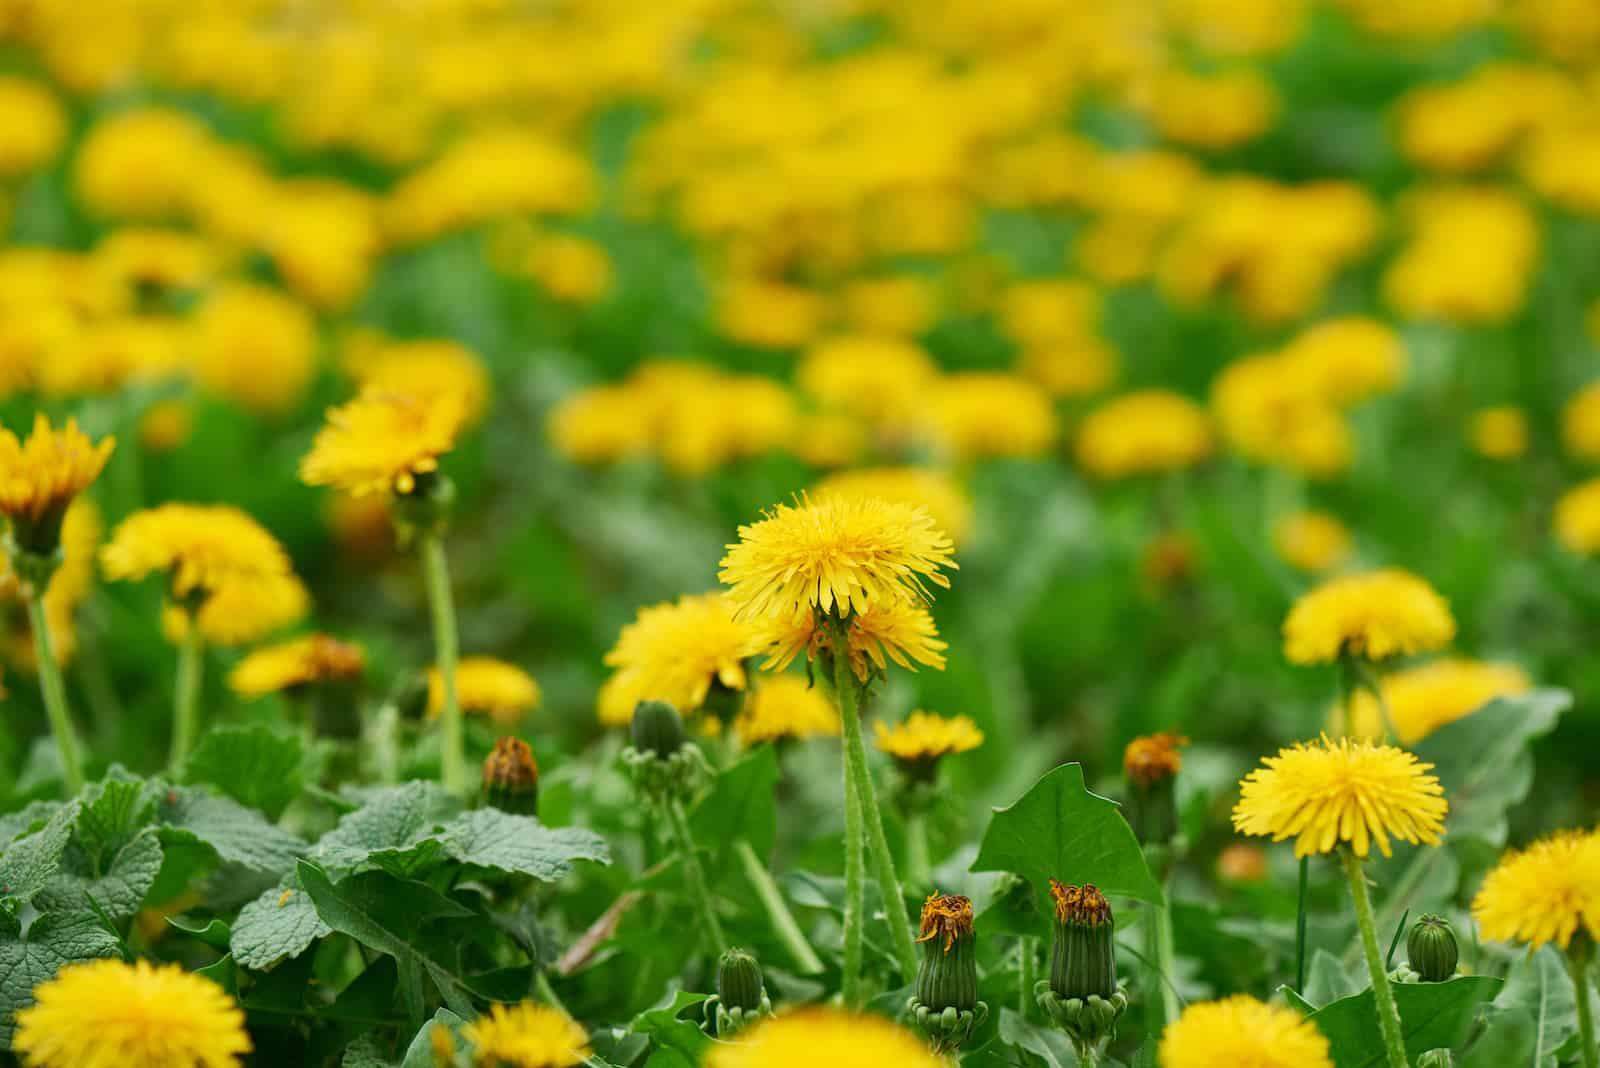 Sow Thistle Vs. Dandelion: SPICEography Showdown